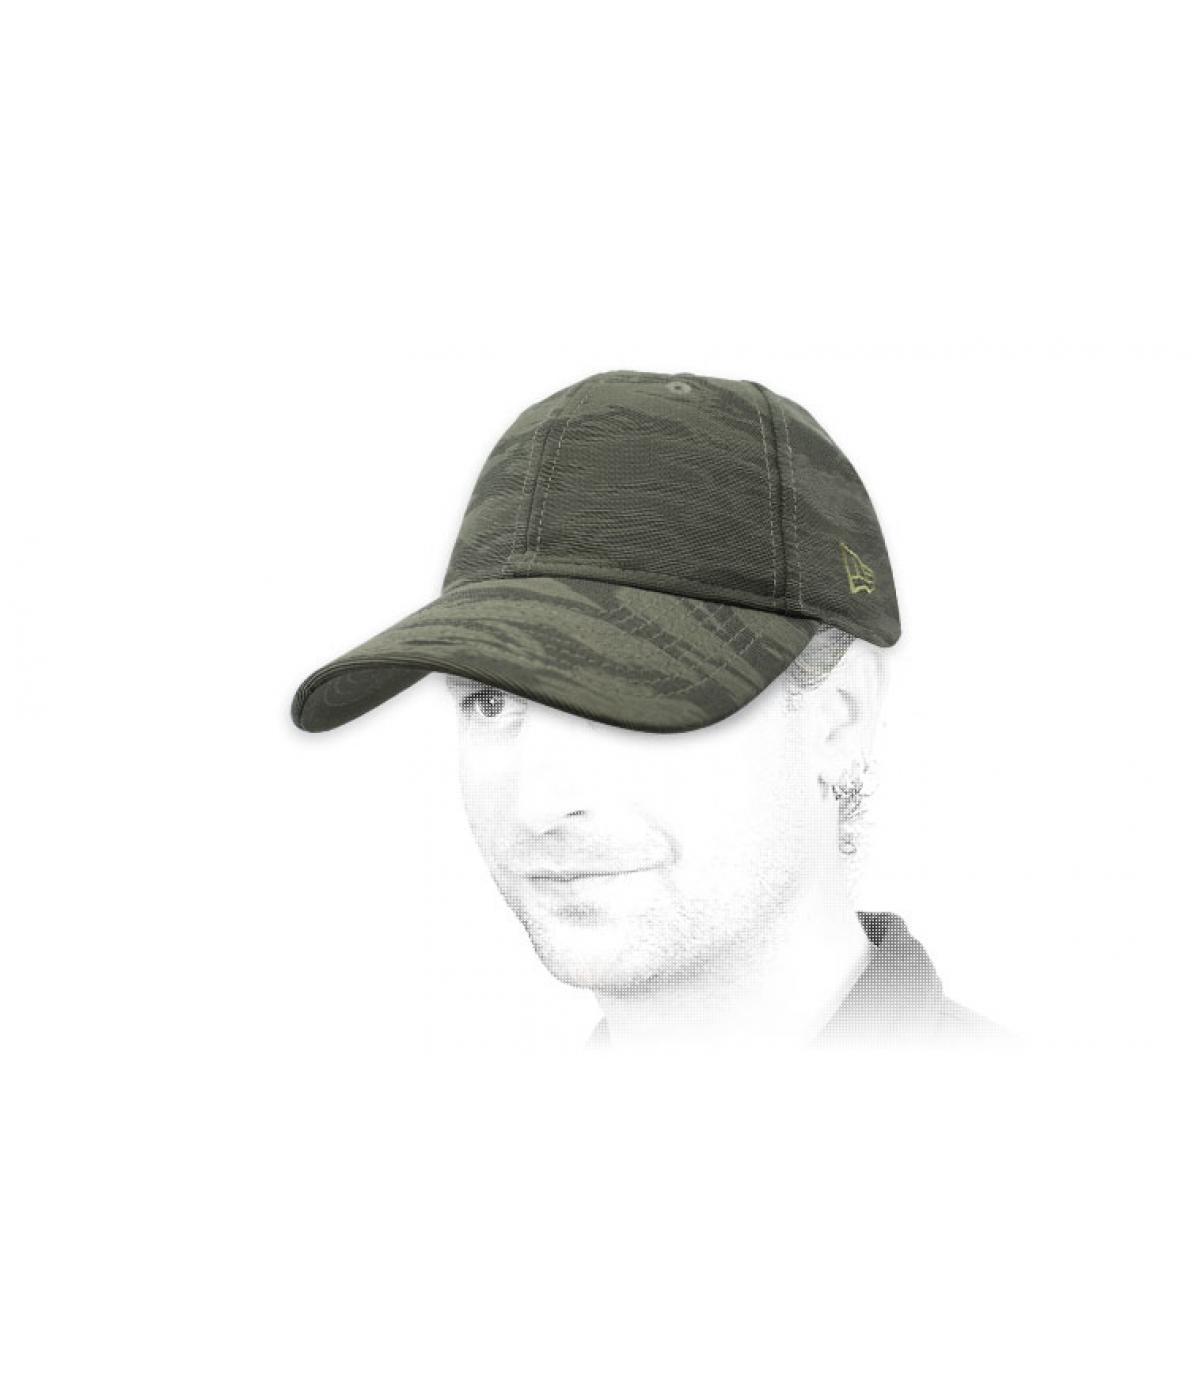 grey camo New Era cap